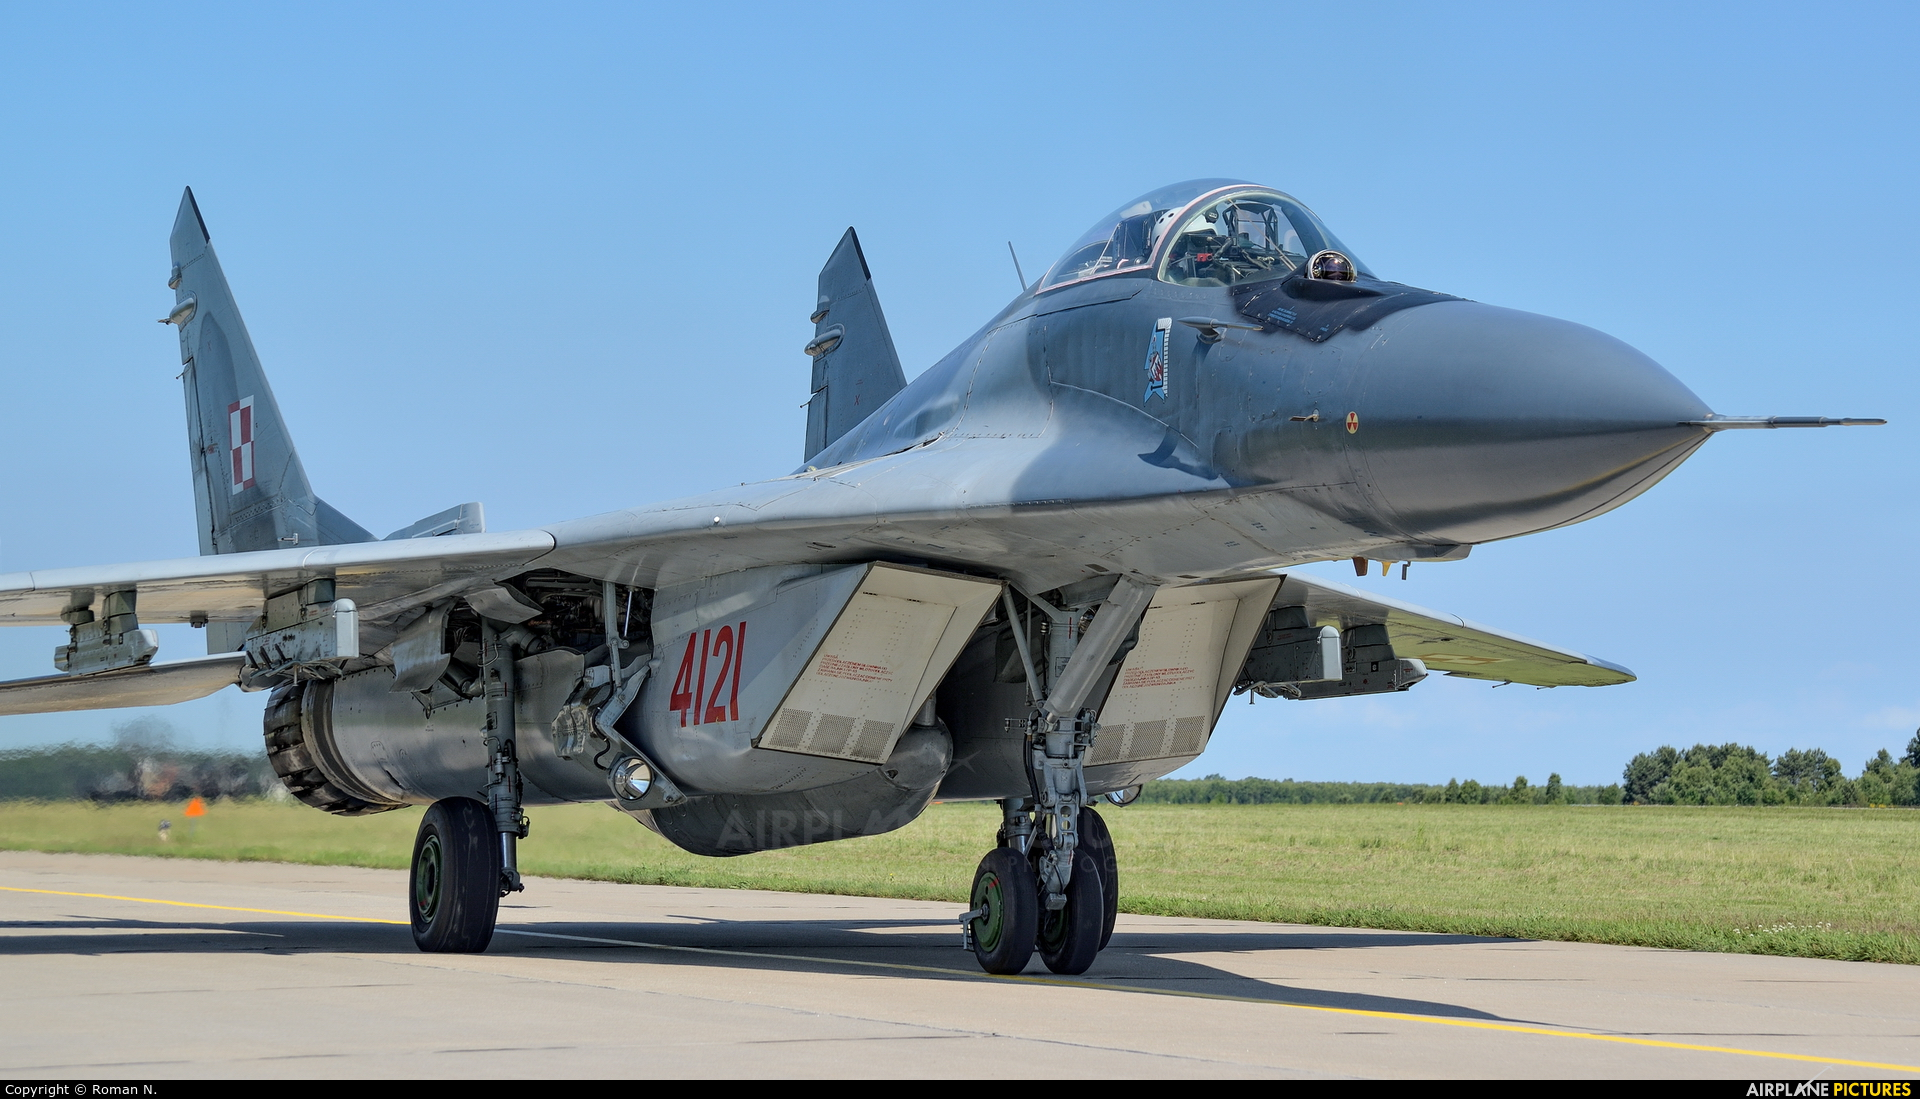 Poland - Air Force 4121 aircraft at Mirosławiec